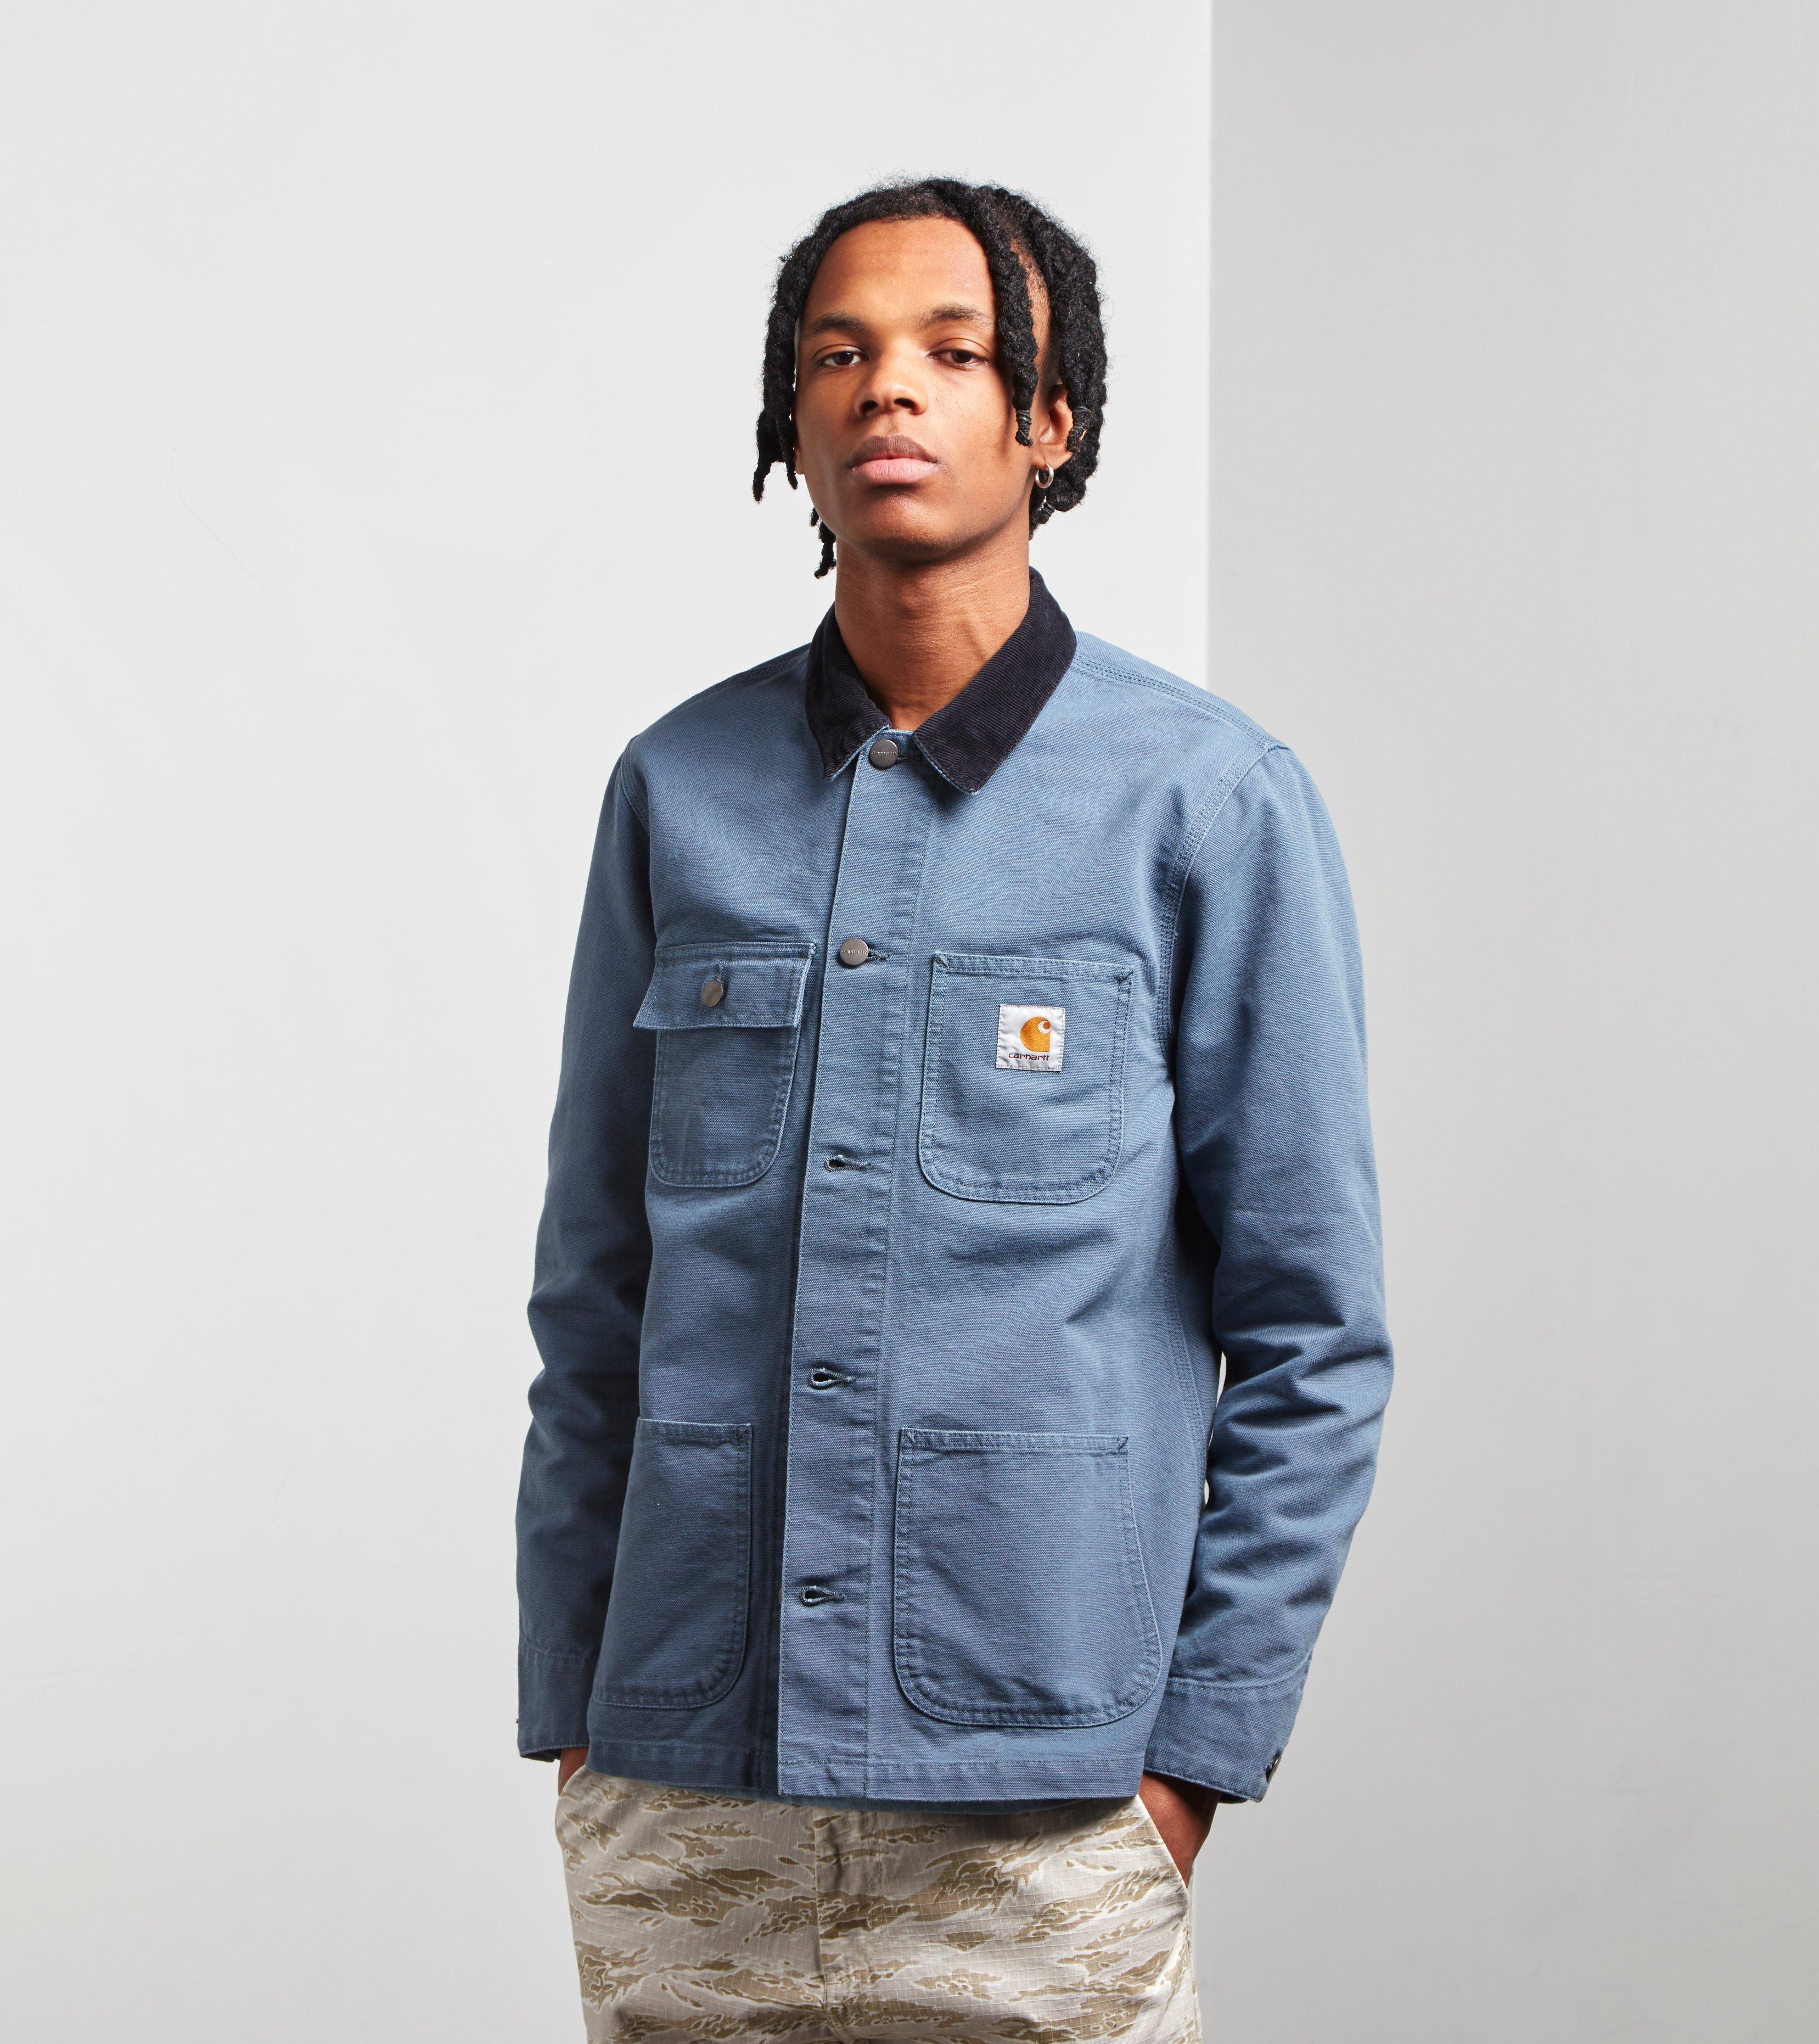 ae97092592a Carhartt WIP Michigan Chore Jacket in Blue for Men - Lyst